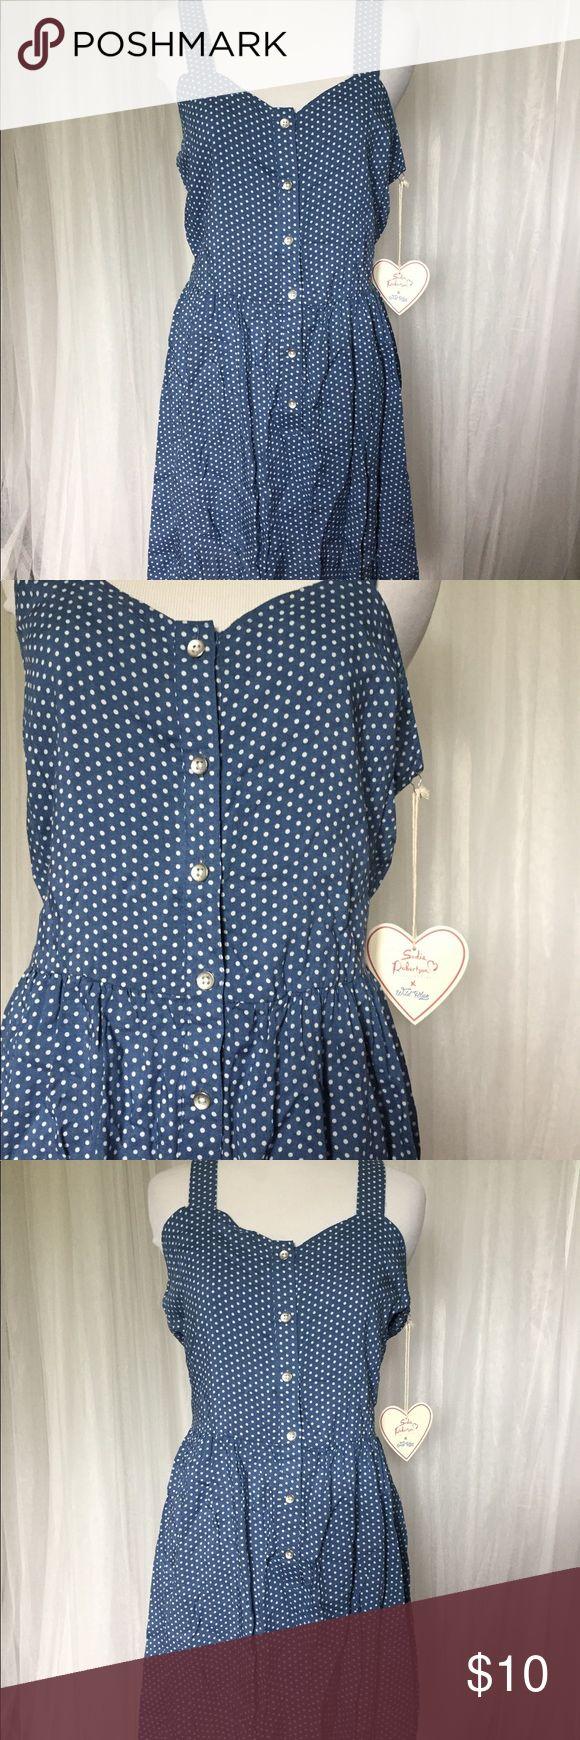 Nwt Sadie Robertson blue polka dot dress size M Sadie Robertson blue polka dot dress size Medium nwt. Button up adorable timeless dress Dresses Mini